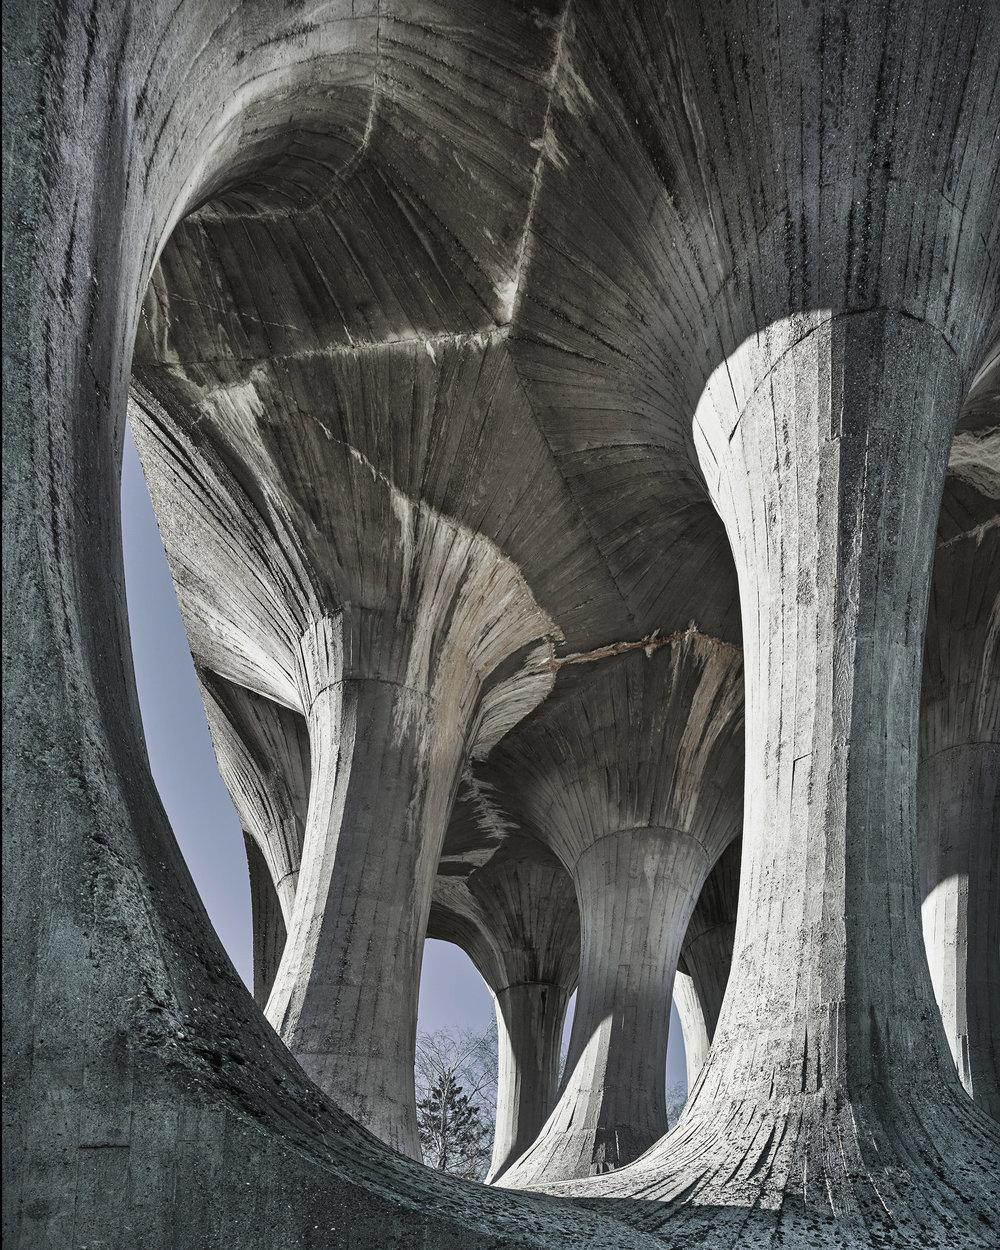 valentin-jeck-photographs-moma-toward-a-concrete-utopia-architecture-yugoslavia_dezeen_2364_col_0.jpg